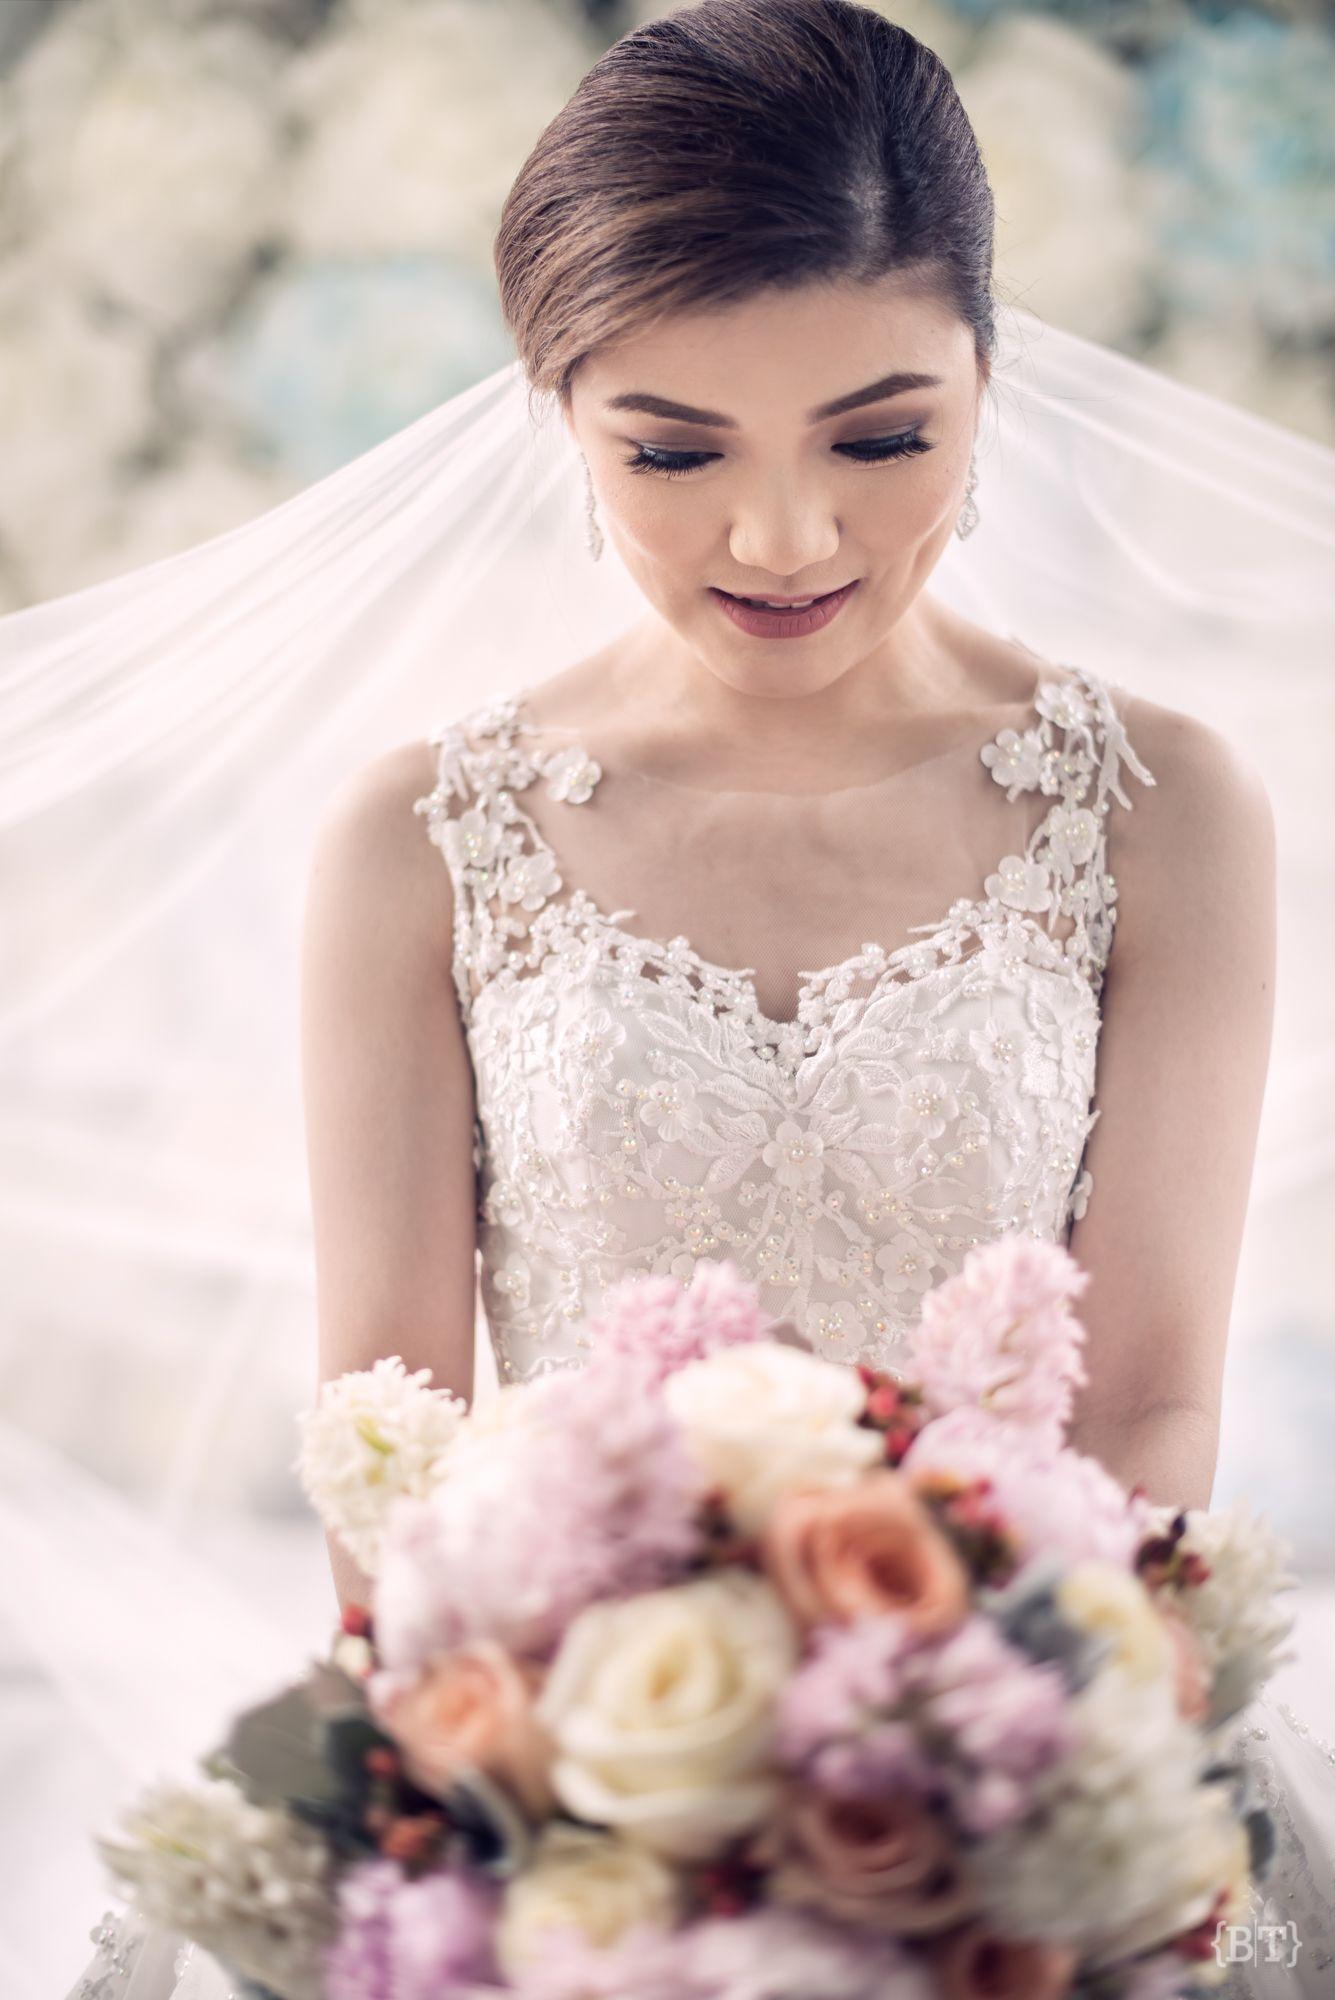 Pin On Wedding Details Inspiration